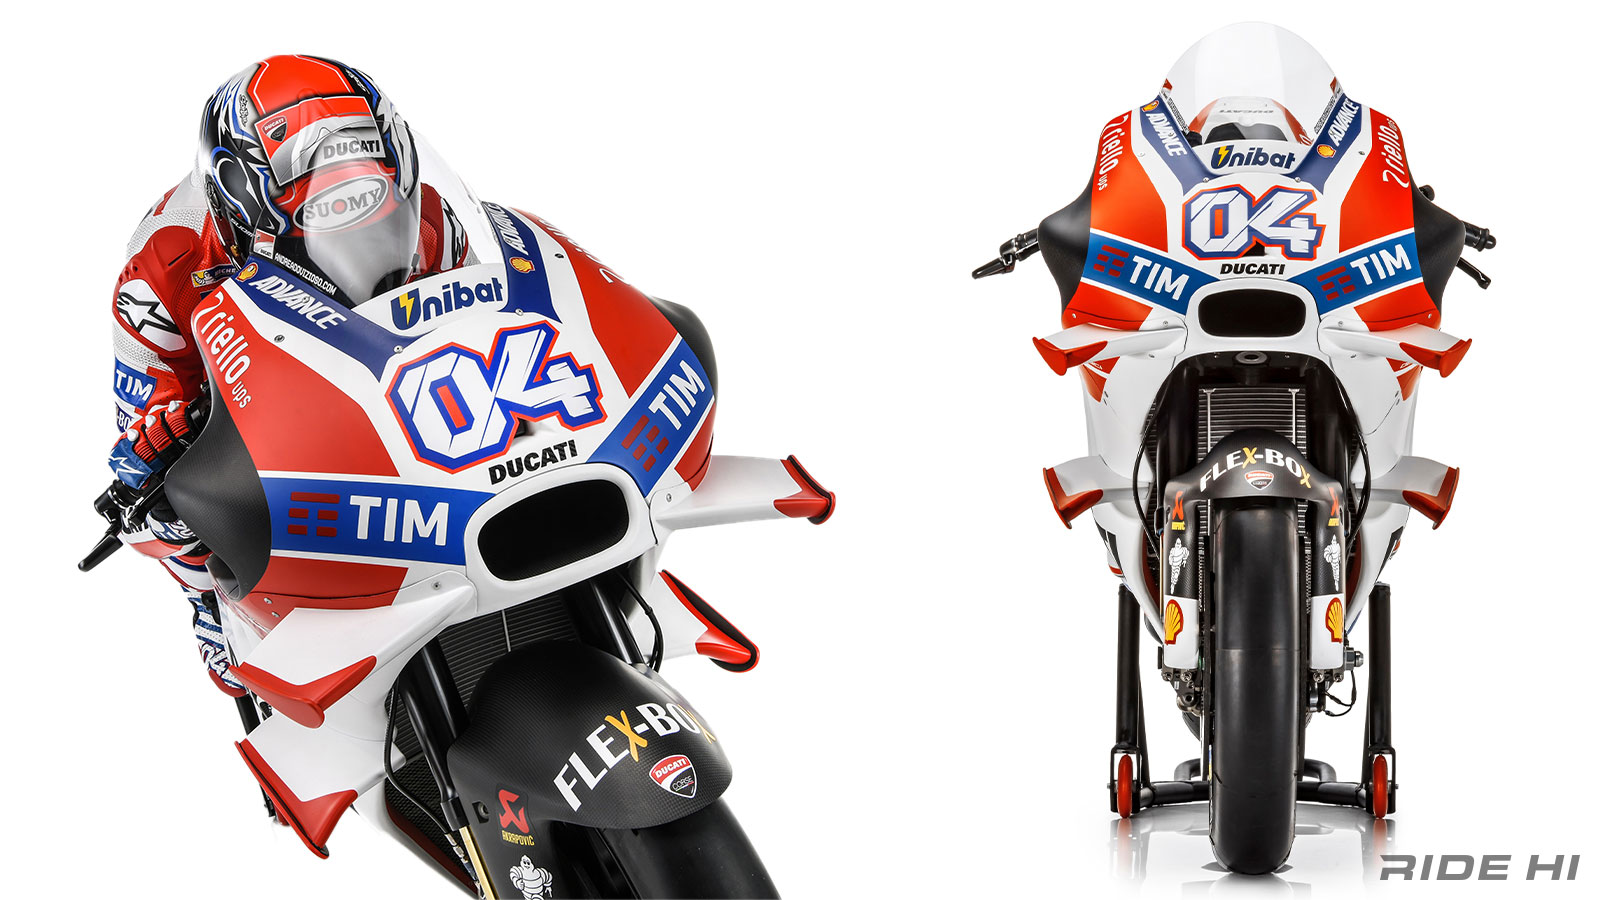 Bi mat dang sau nhung canh gio winglet tren MotoGP - 3